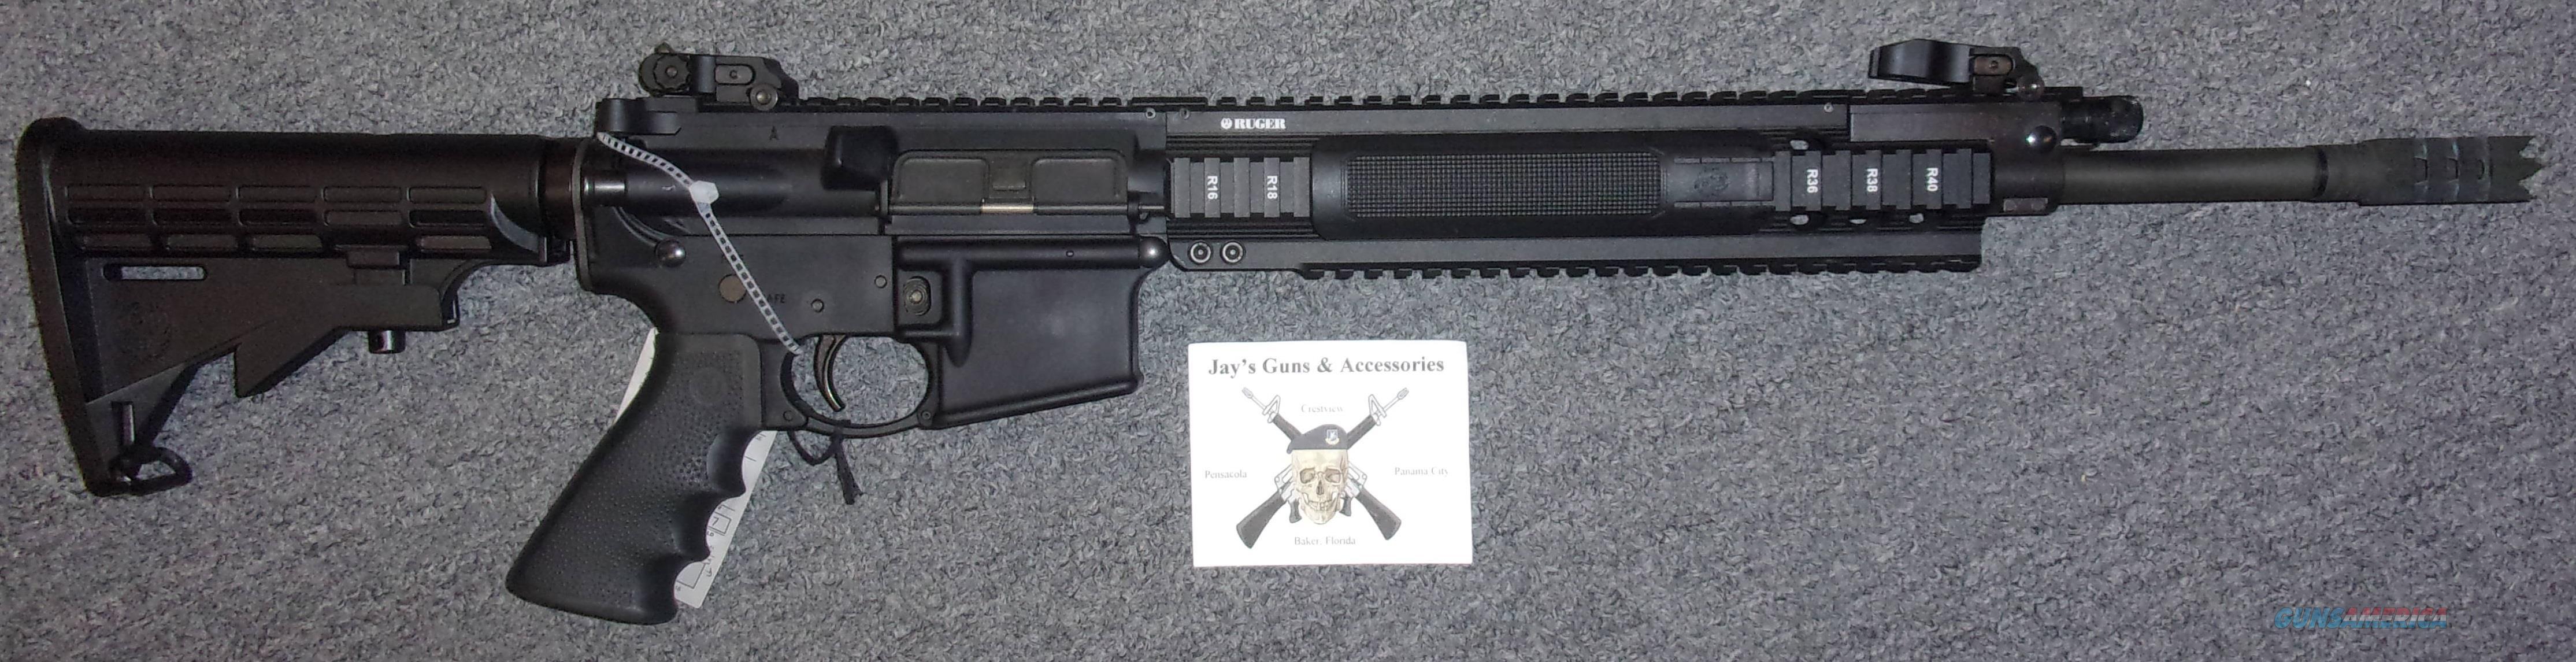 Ruger SR-556 (Gas Piston)  Guns > Rifles > Ruger Rifles > SR Series